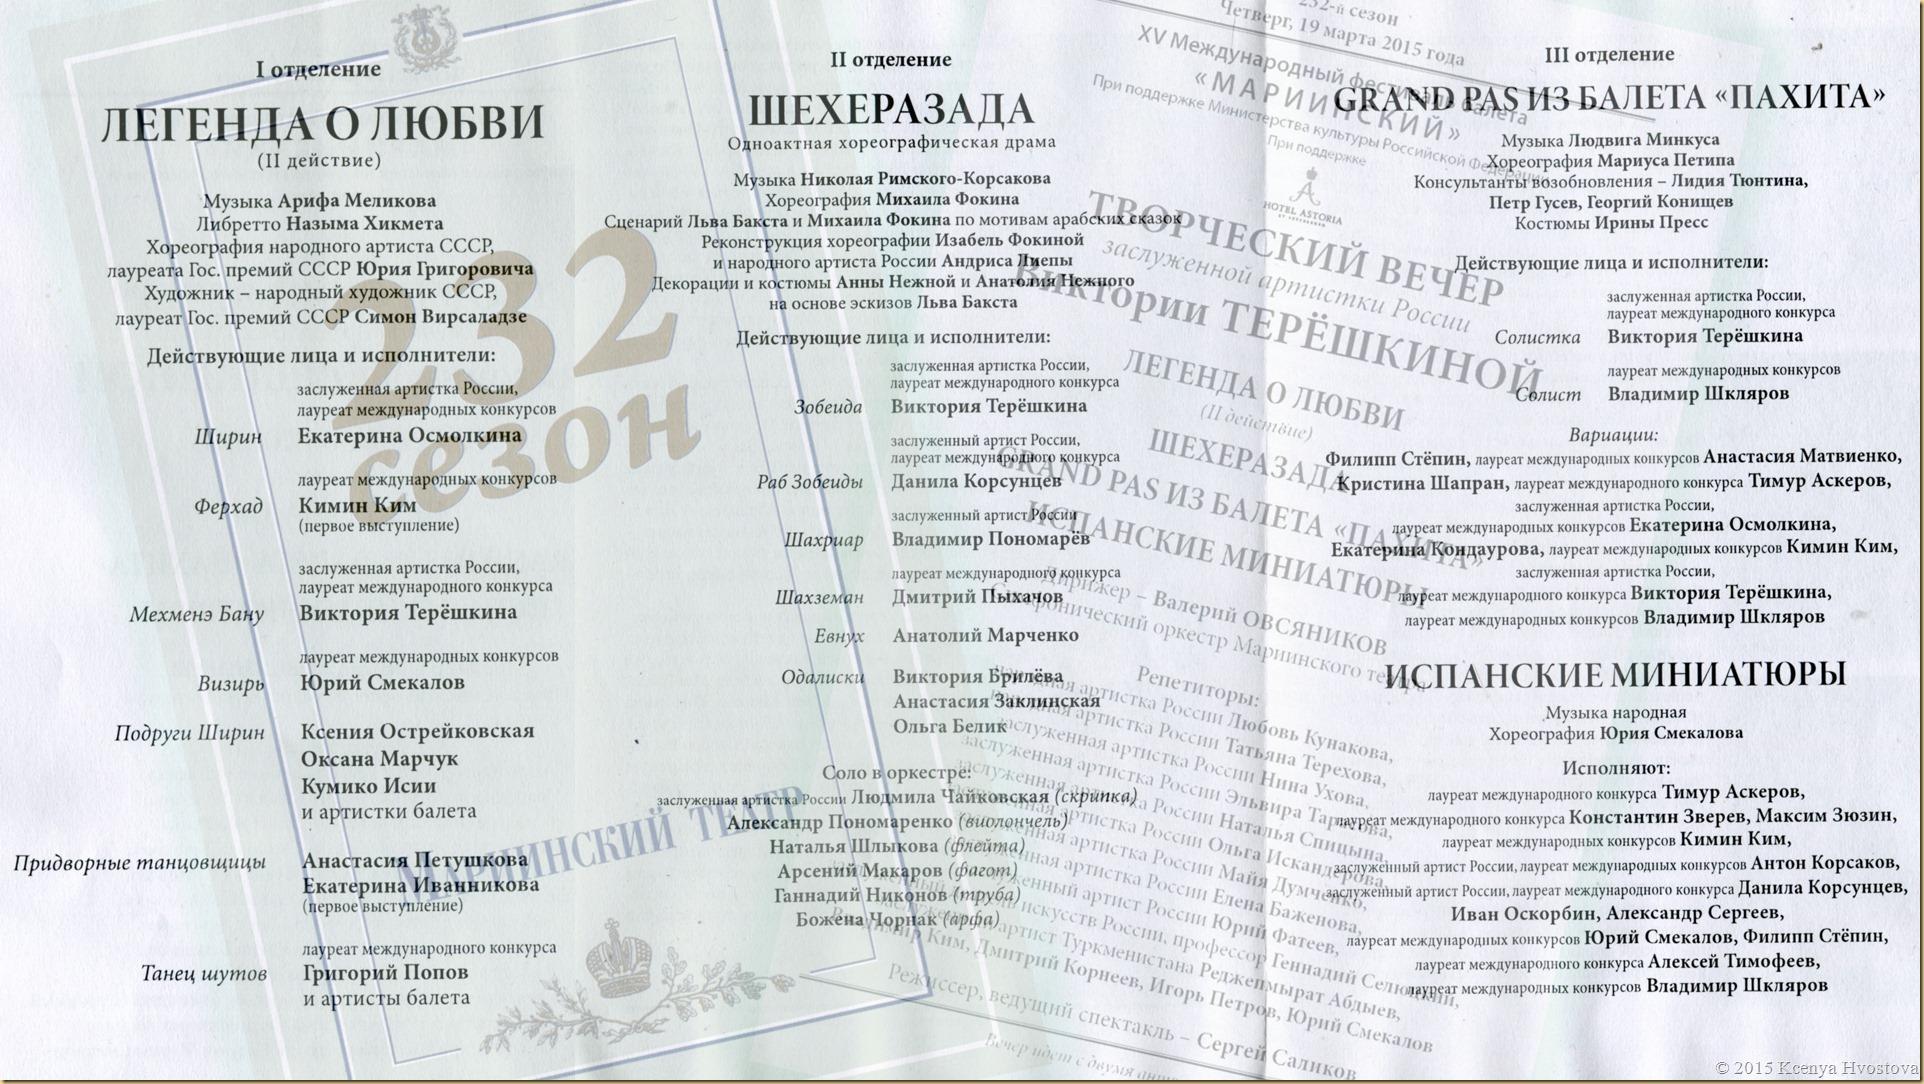 Виктория Терёшкина